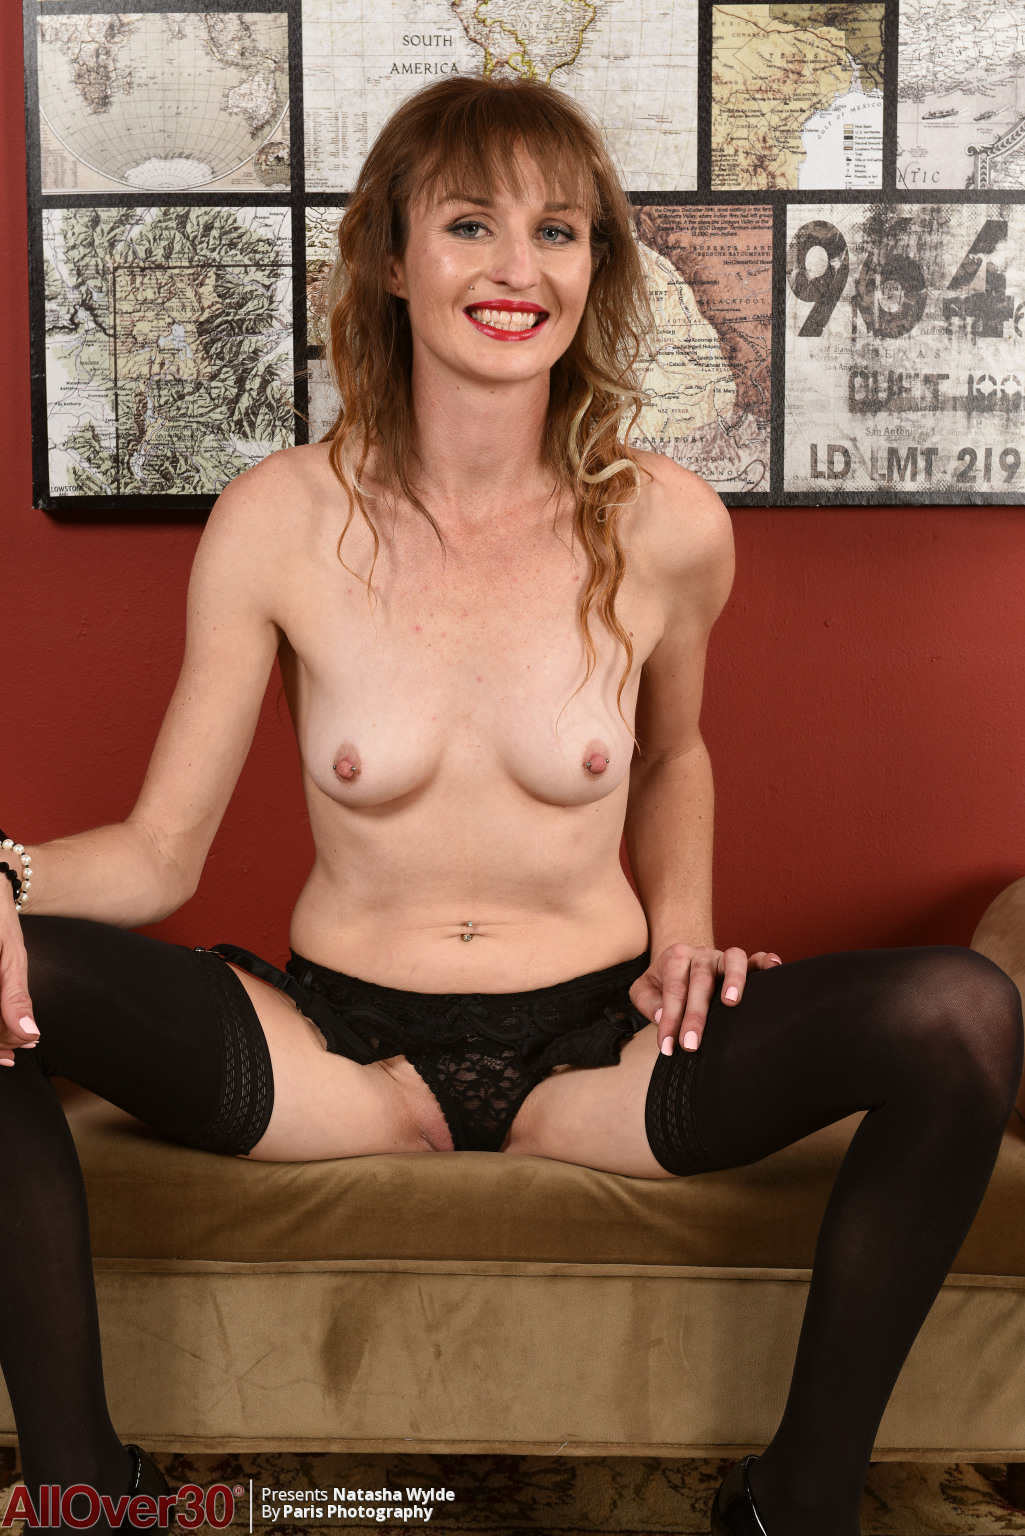 Natasha-wylde-sexy-lingerie-10